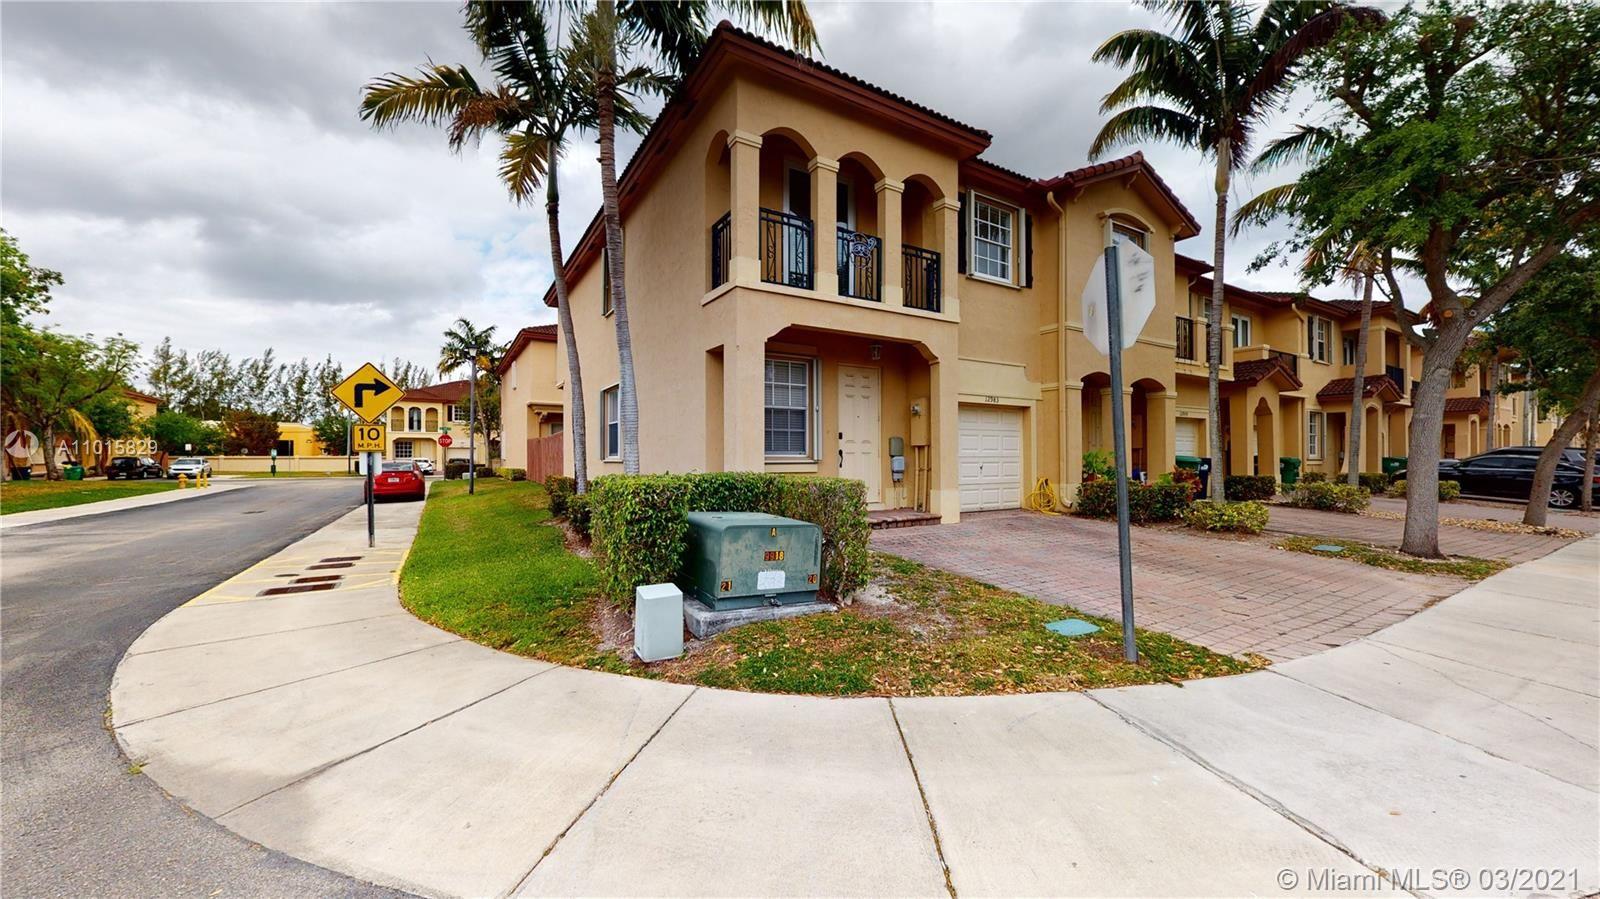 12983 SW 133rd St, Miami, FL 33186 - #: A11015829